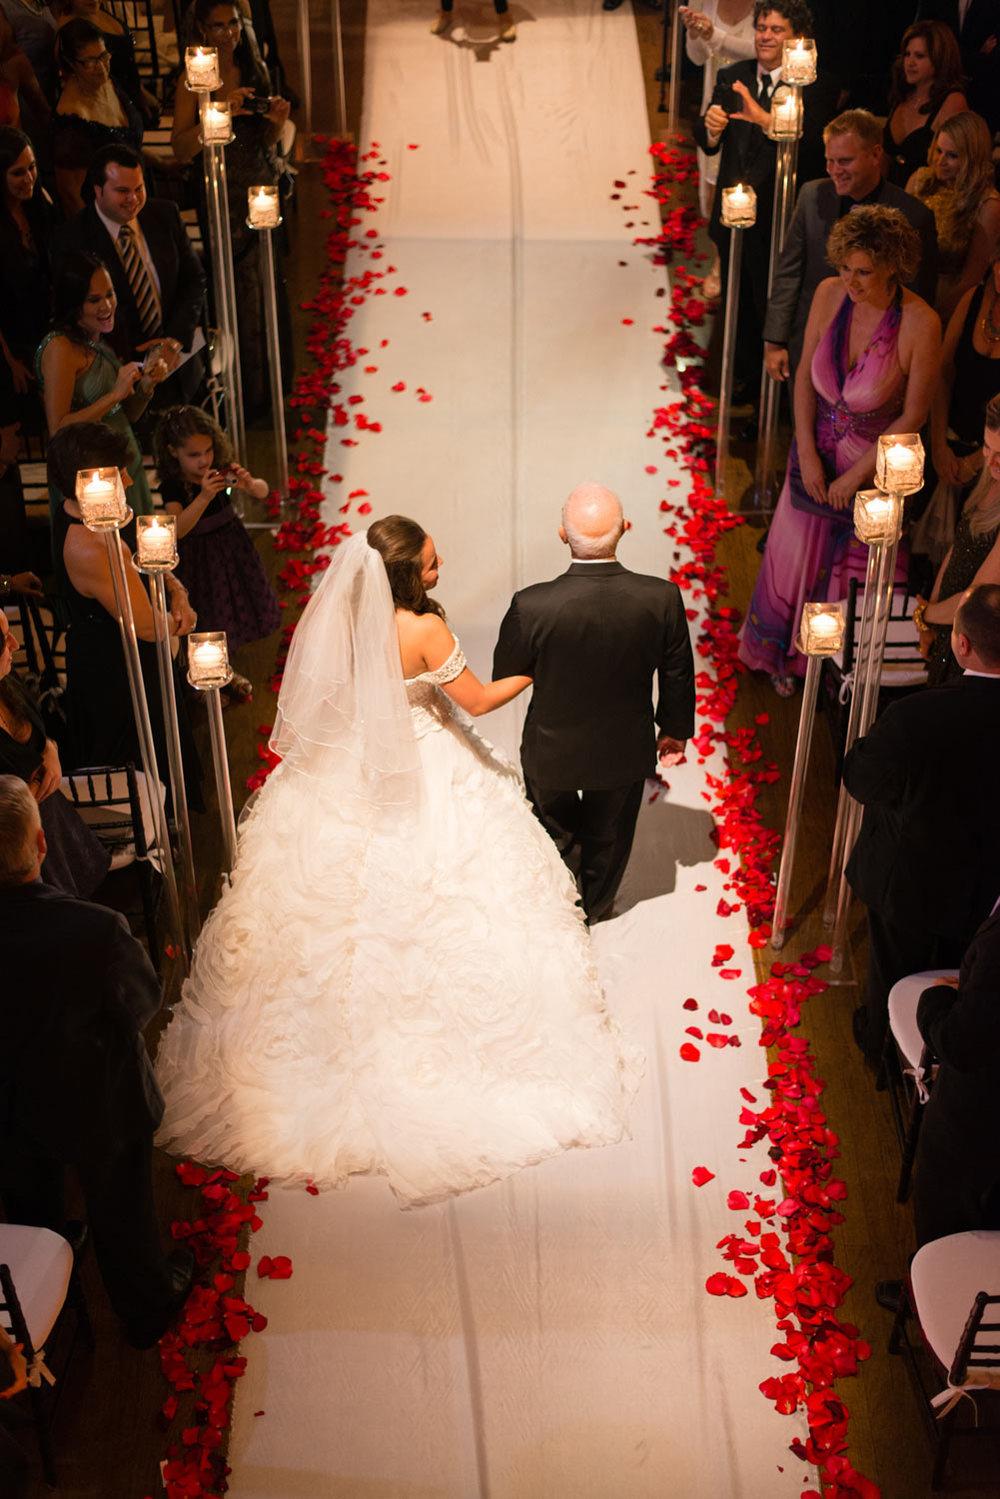 harriet_himmel_theater_wedding-0156.jpg